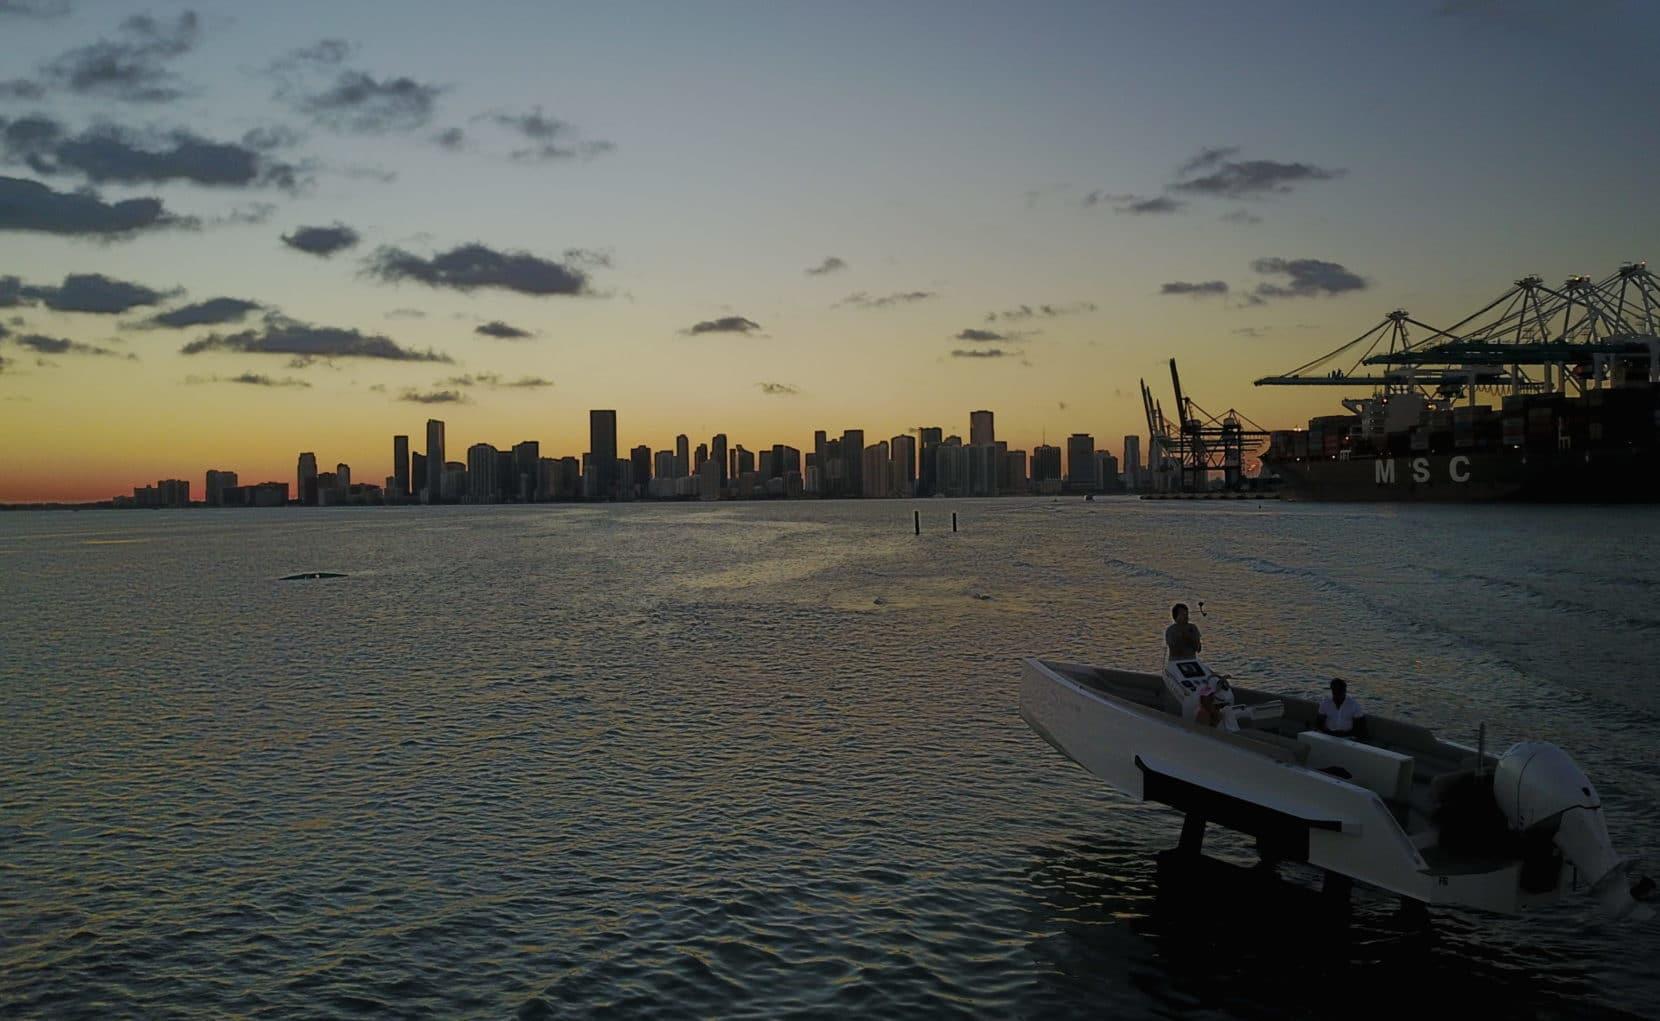 Sunset aboard the Iguana Original